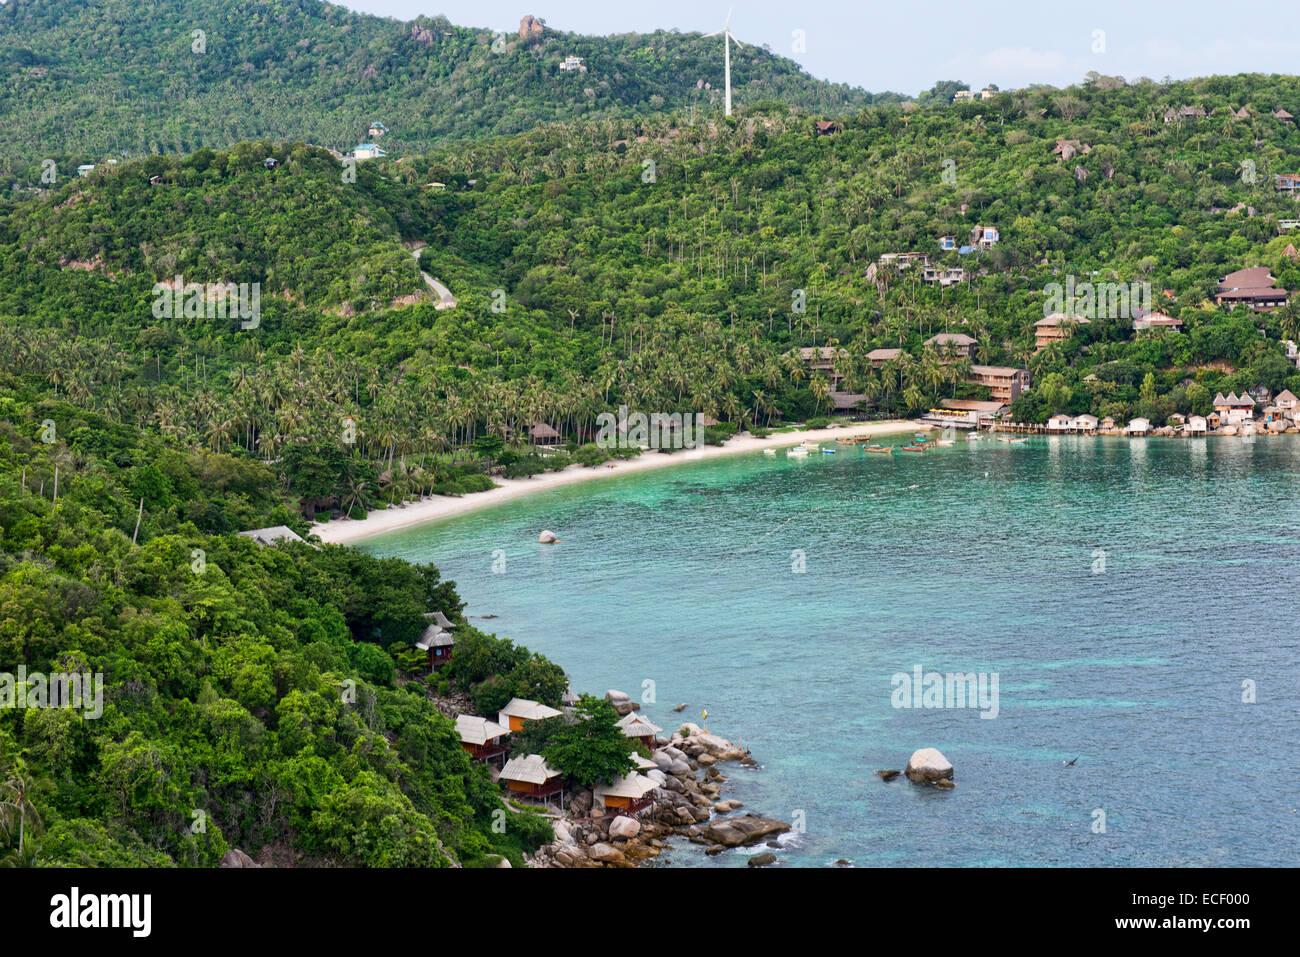 birdseye view of Haad Tien Beach from the John Suwan Viewpoint, Koh Tao, Thailand - Stock Image